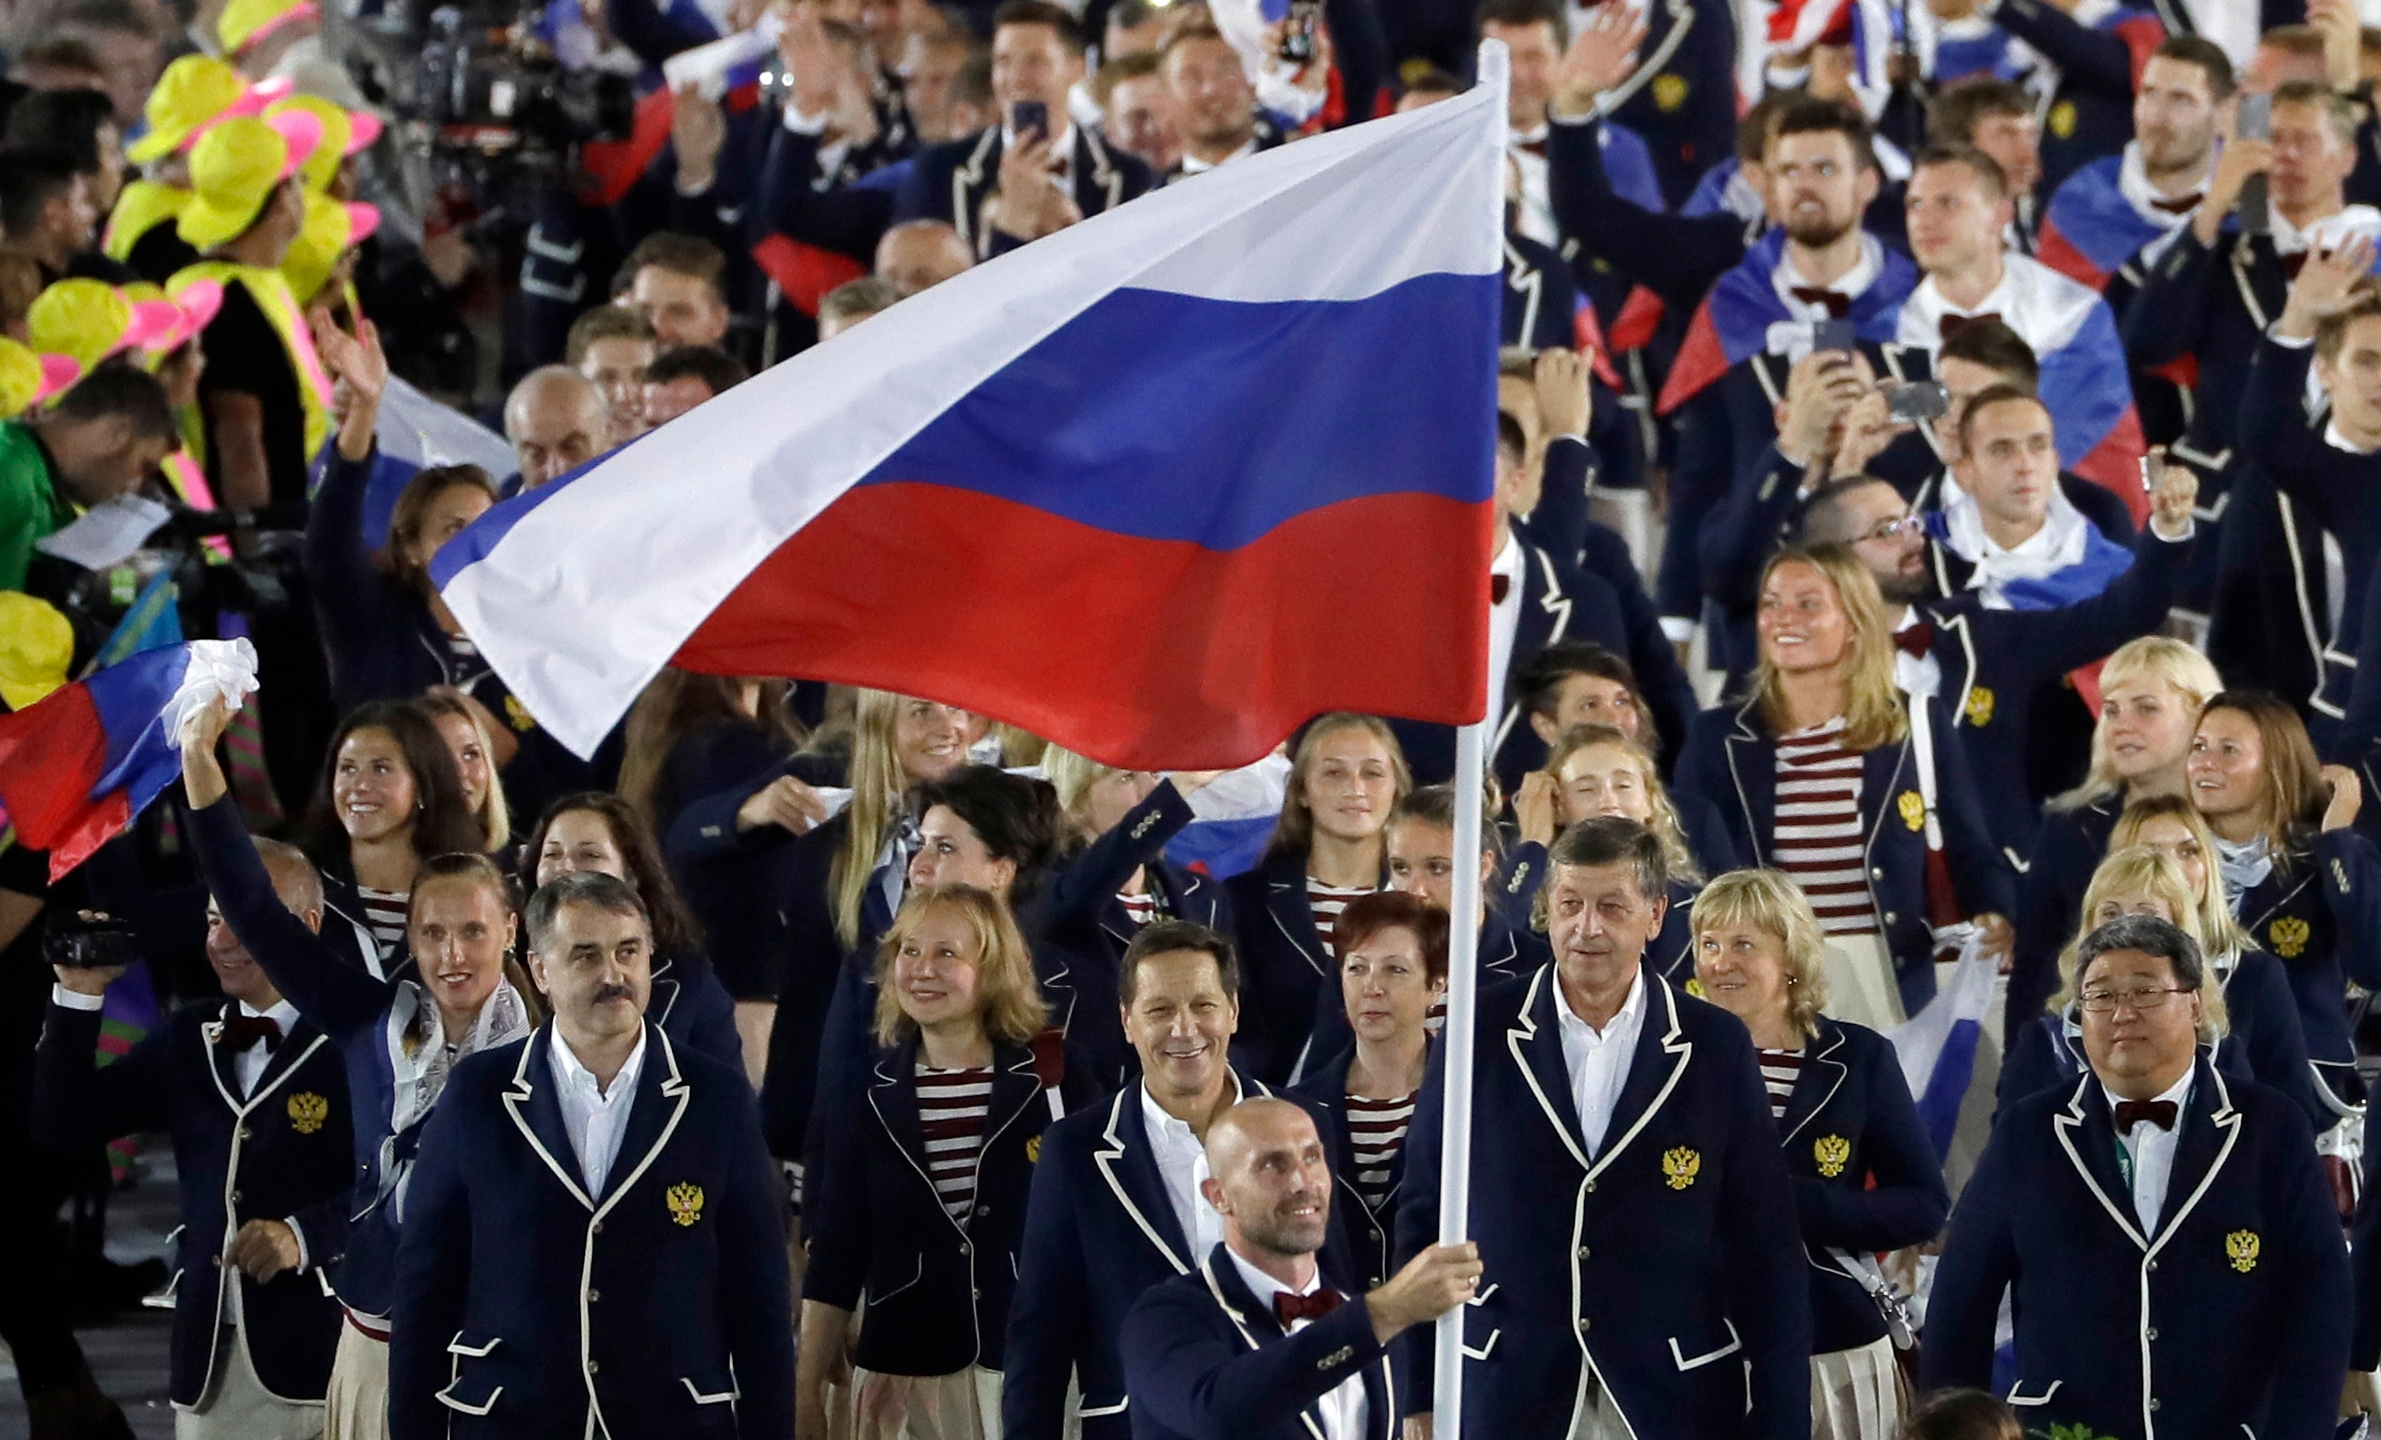 Russian_Doping_91842-159532.jpg16845497